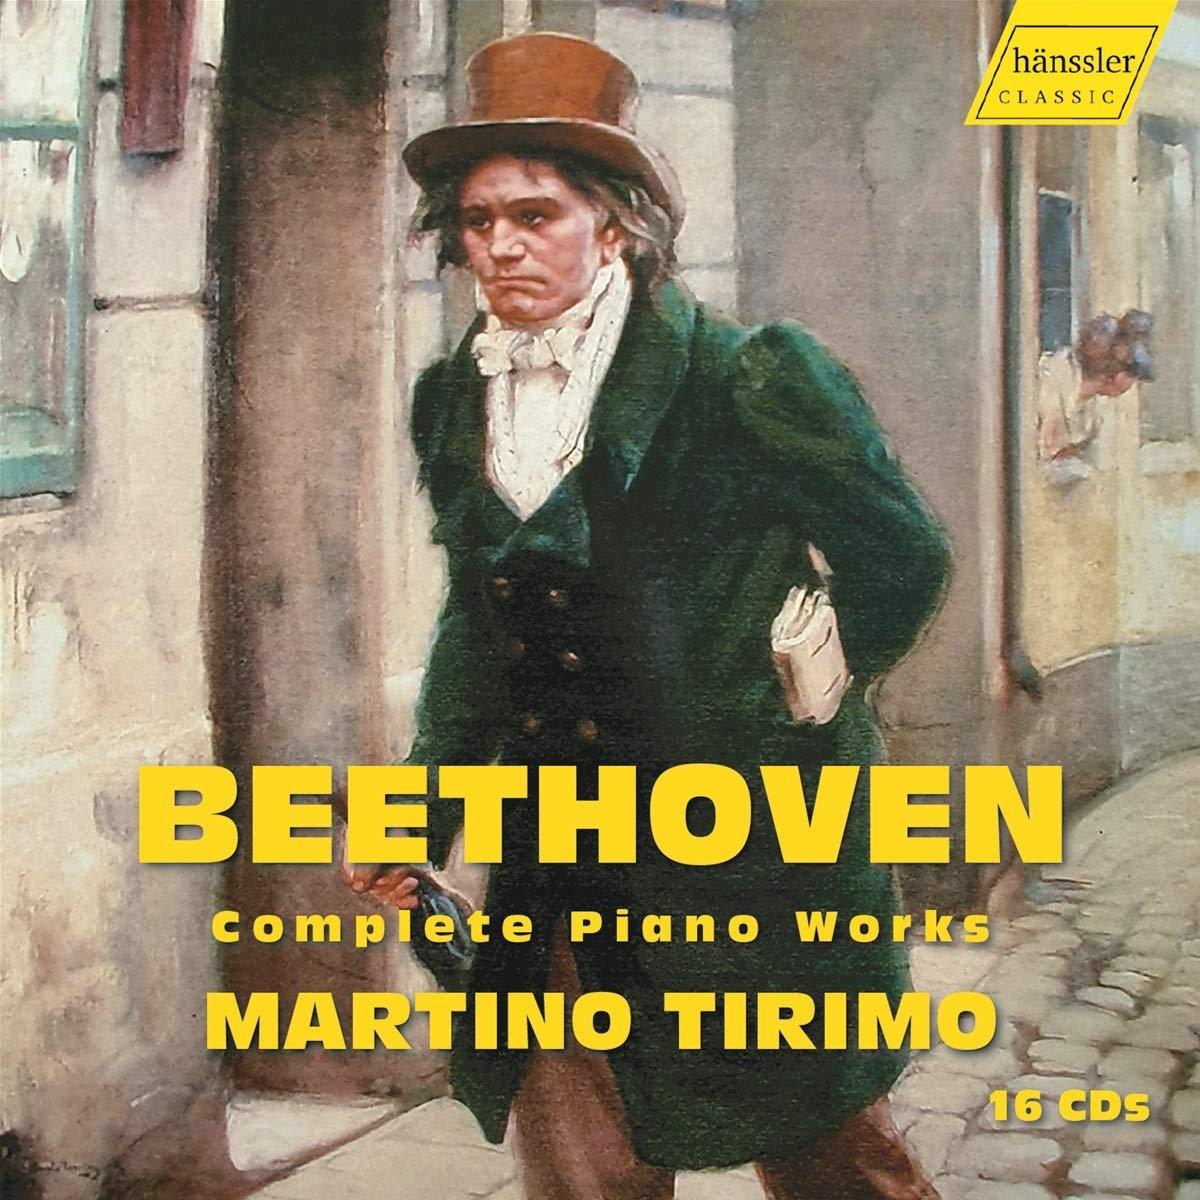 Complete Piano Works by Profil - G Haenssler